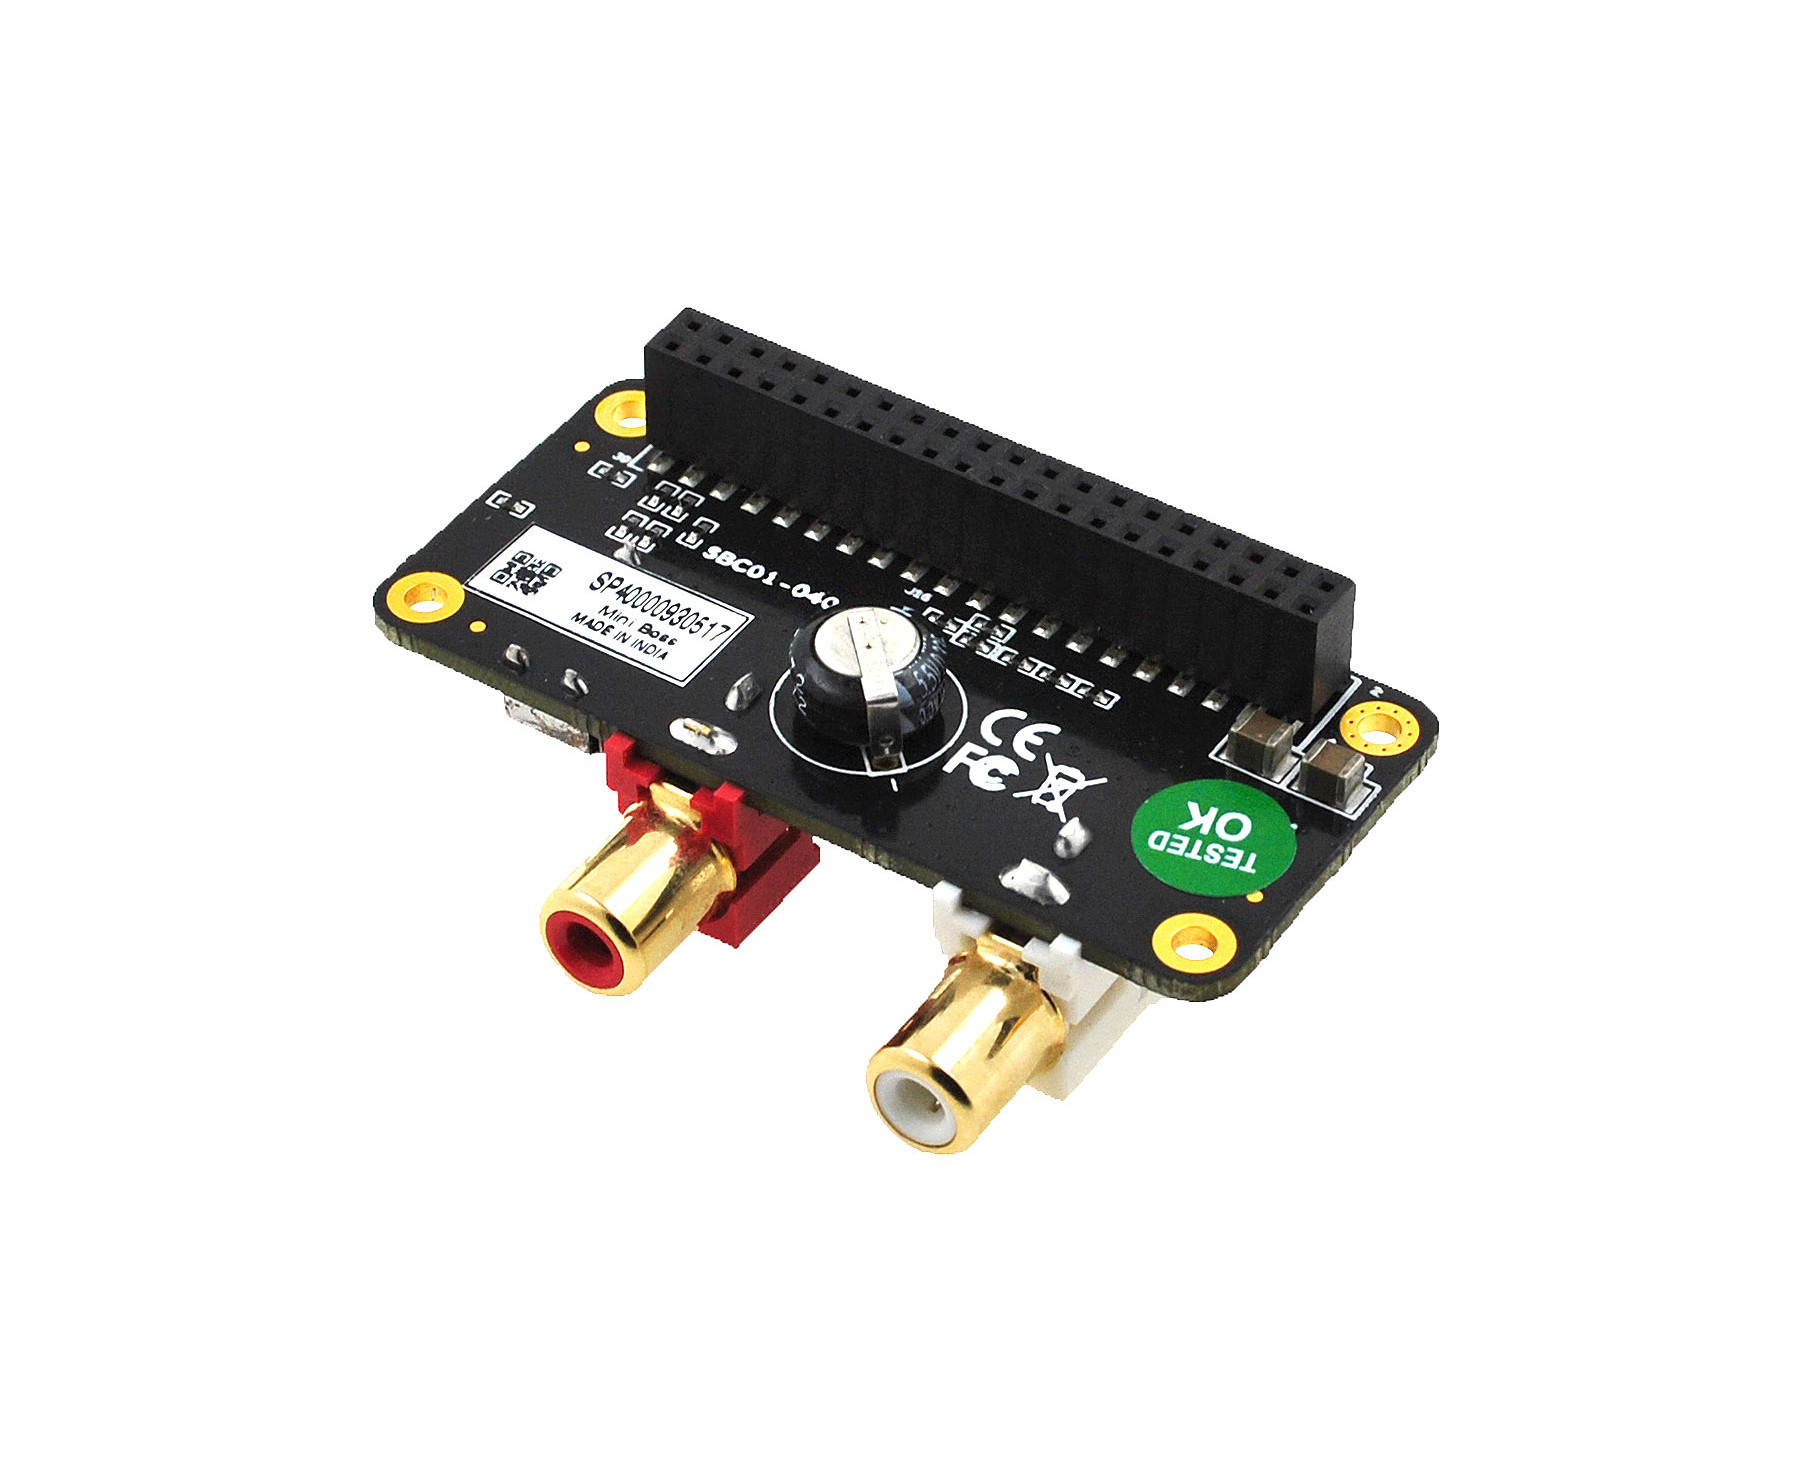 miniBoss i2s dac for PI Zero